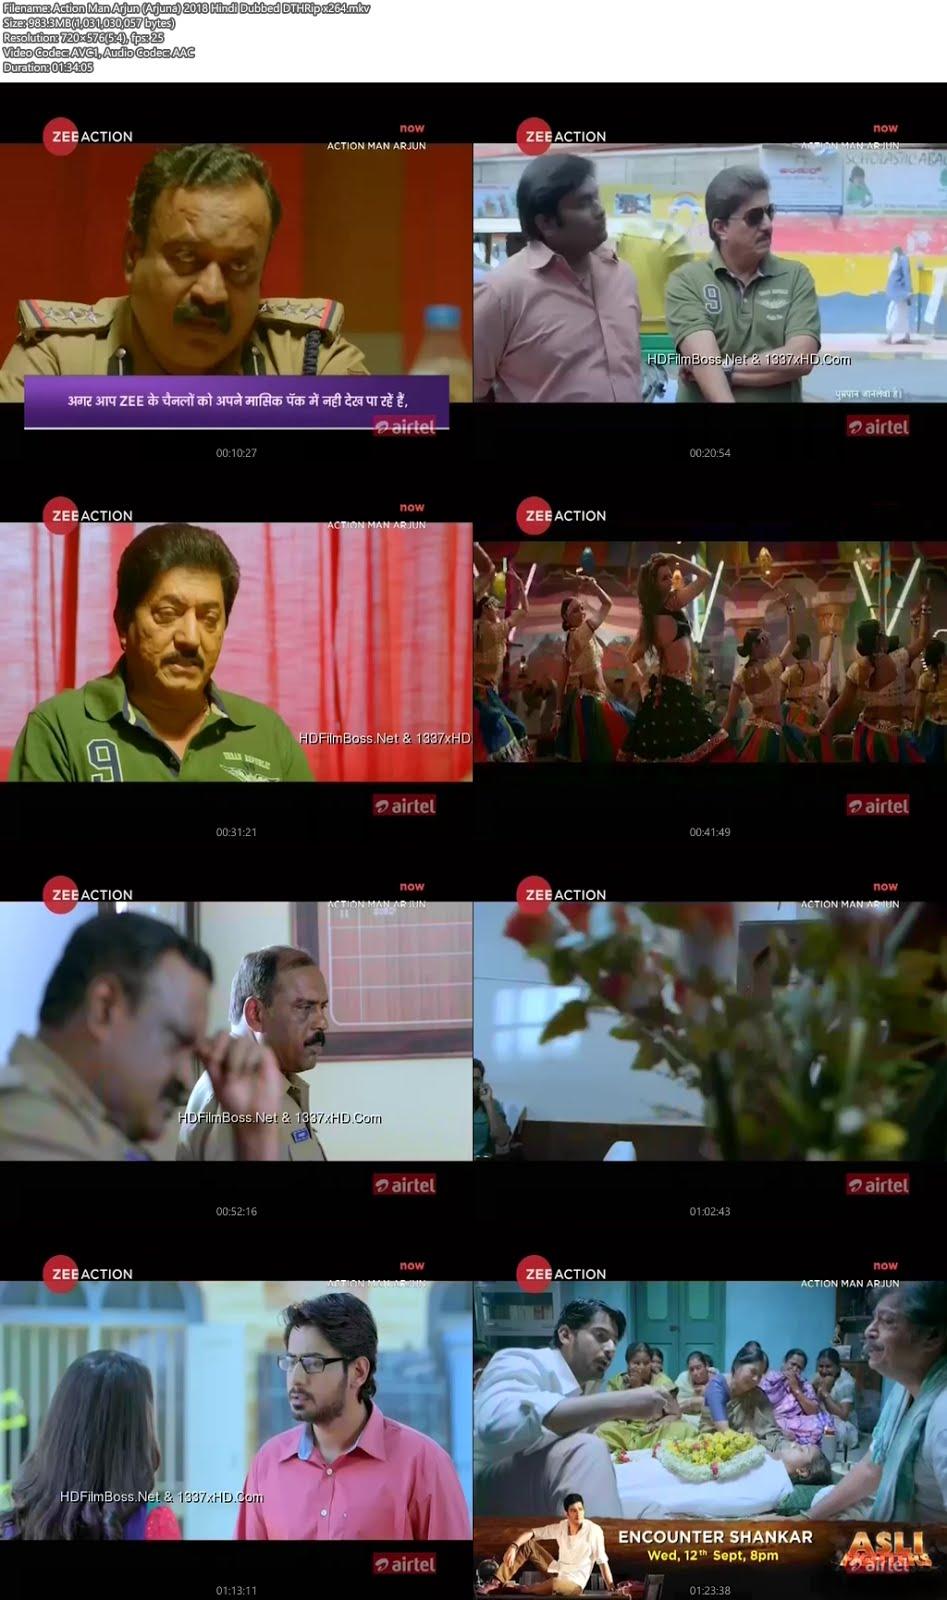 Action Man Arjun Arjuna 2018 Hindi Dubbed DTHRip | 480p 300MB | 100MB HEVC Screenshot